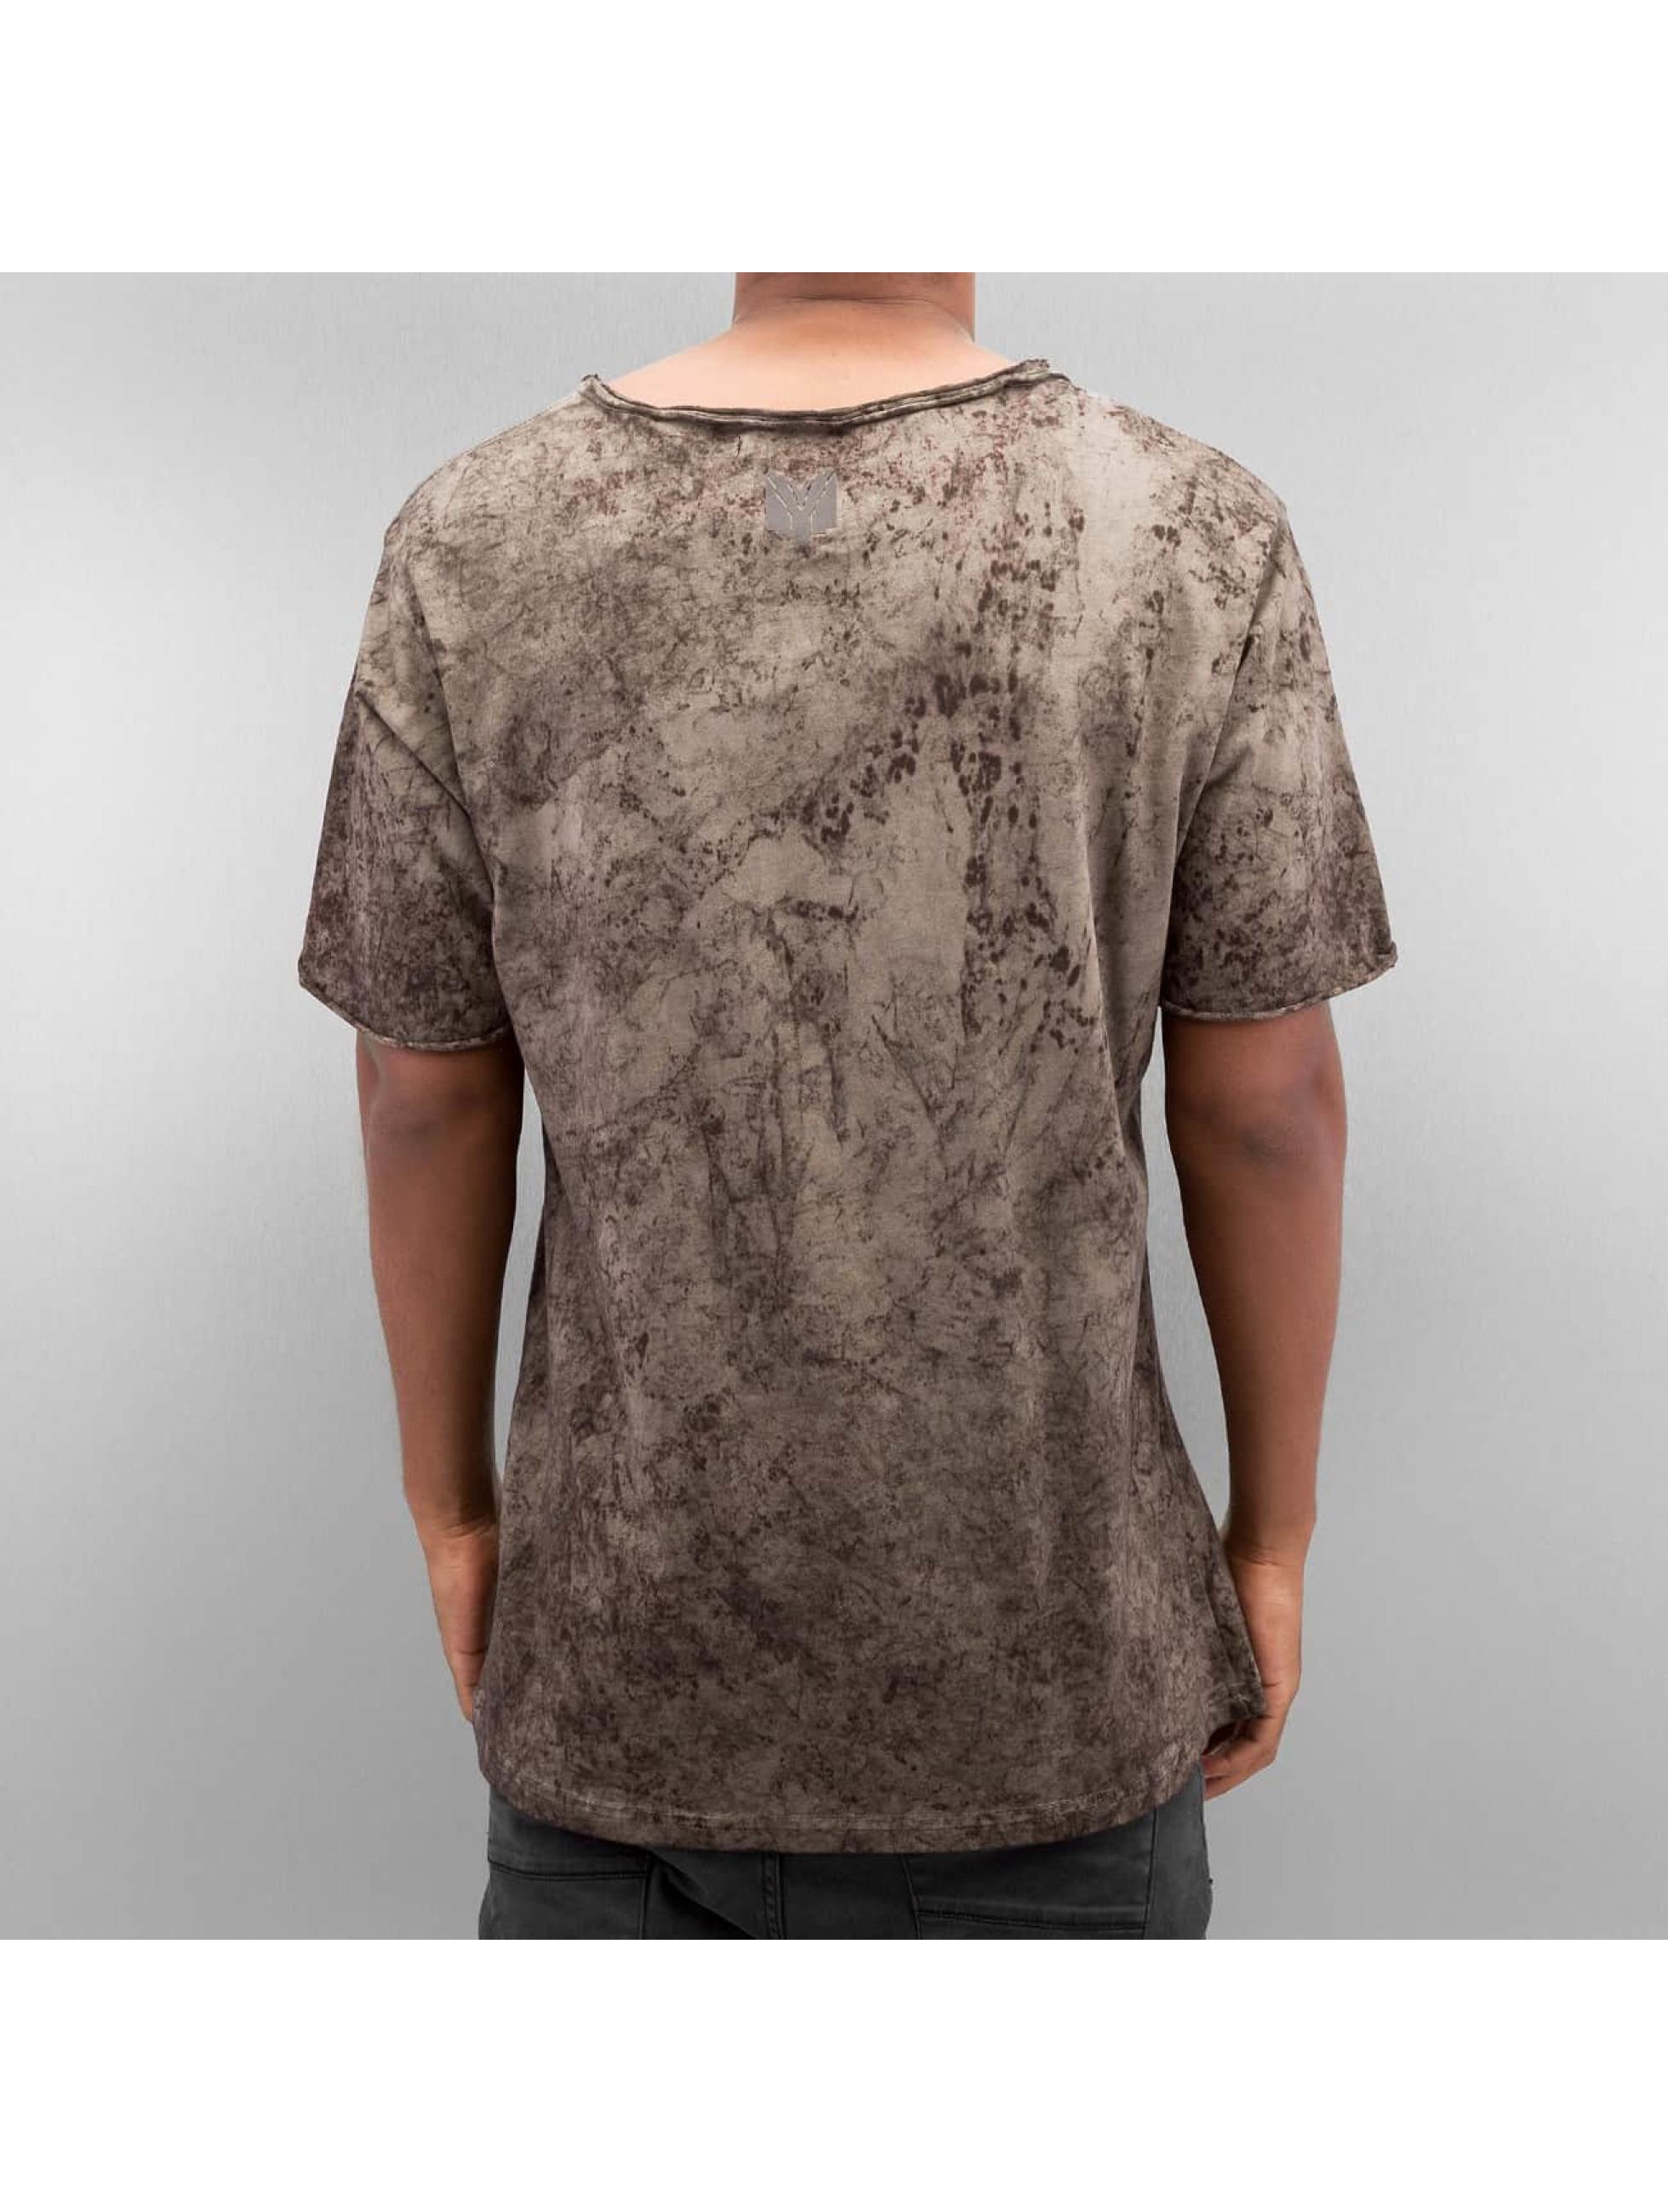 Yezz T-Shirt Marble grey